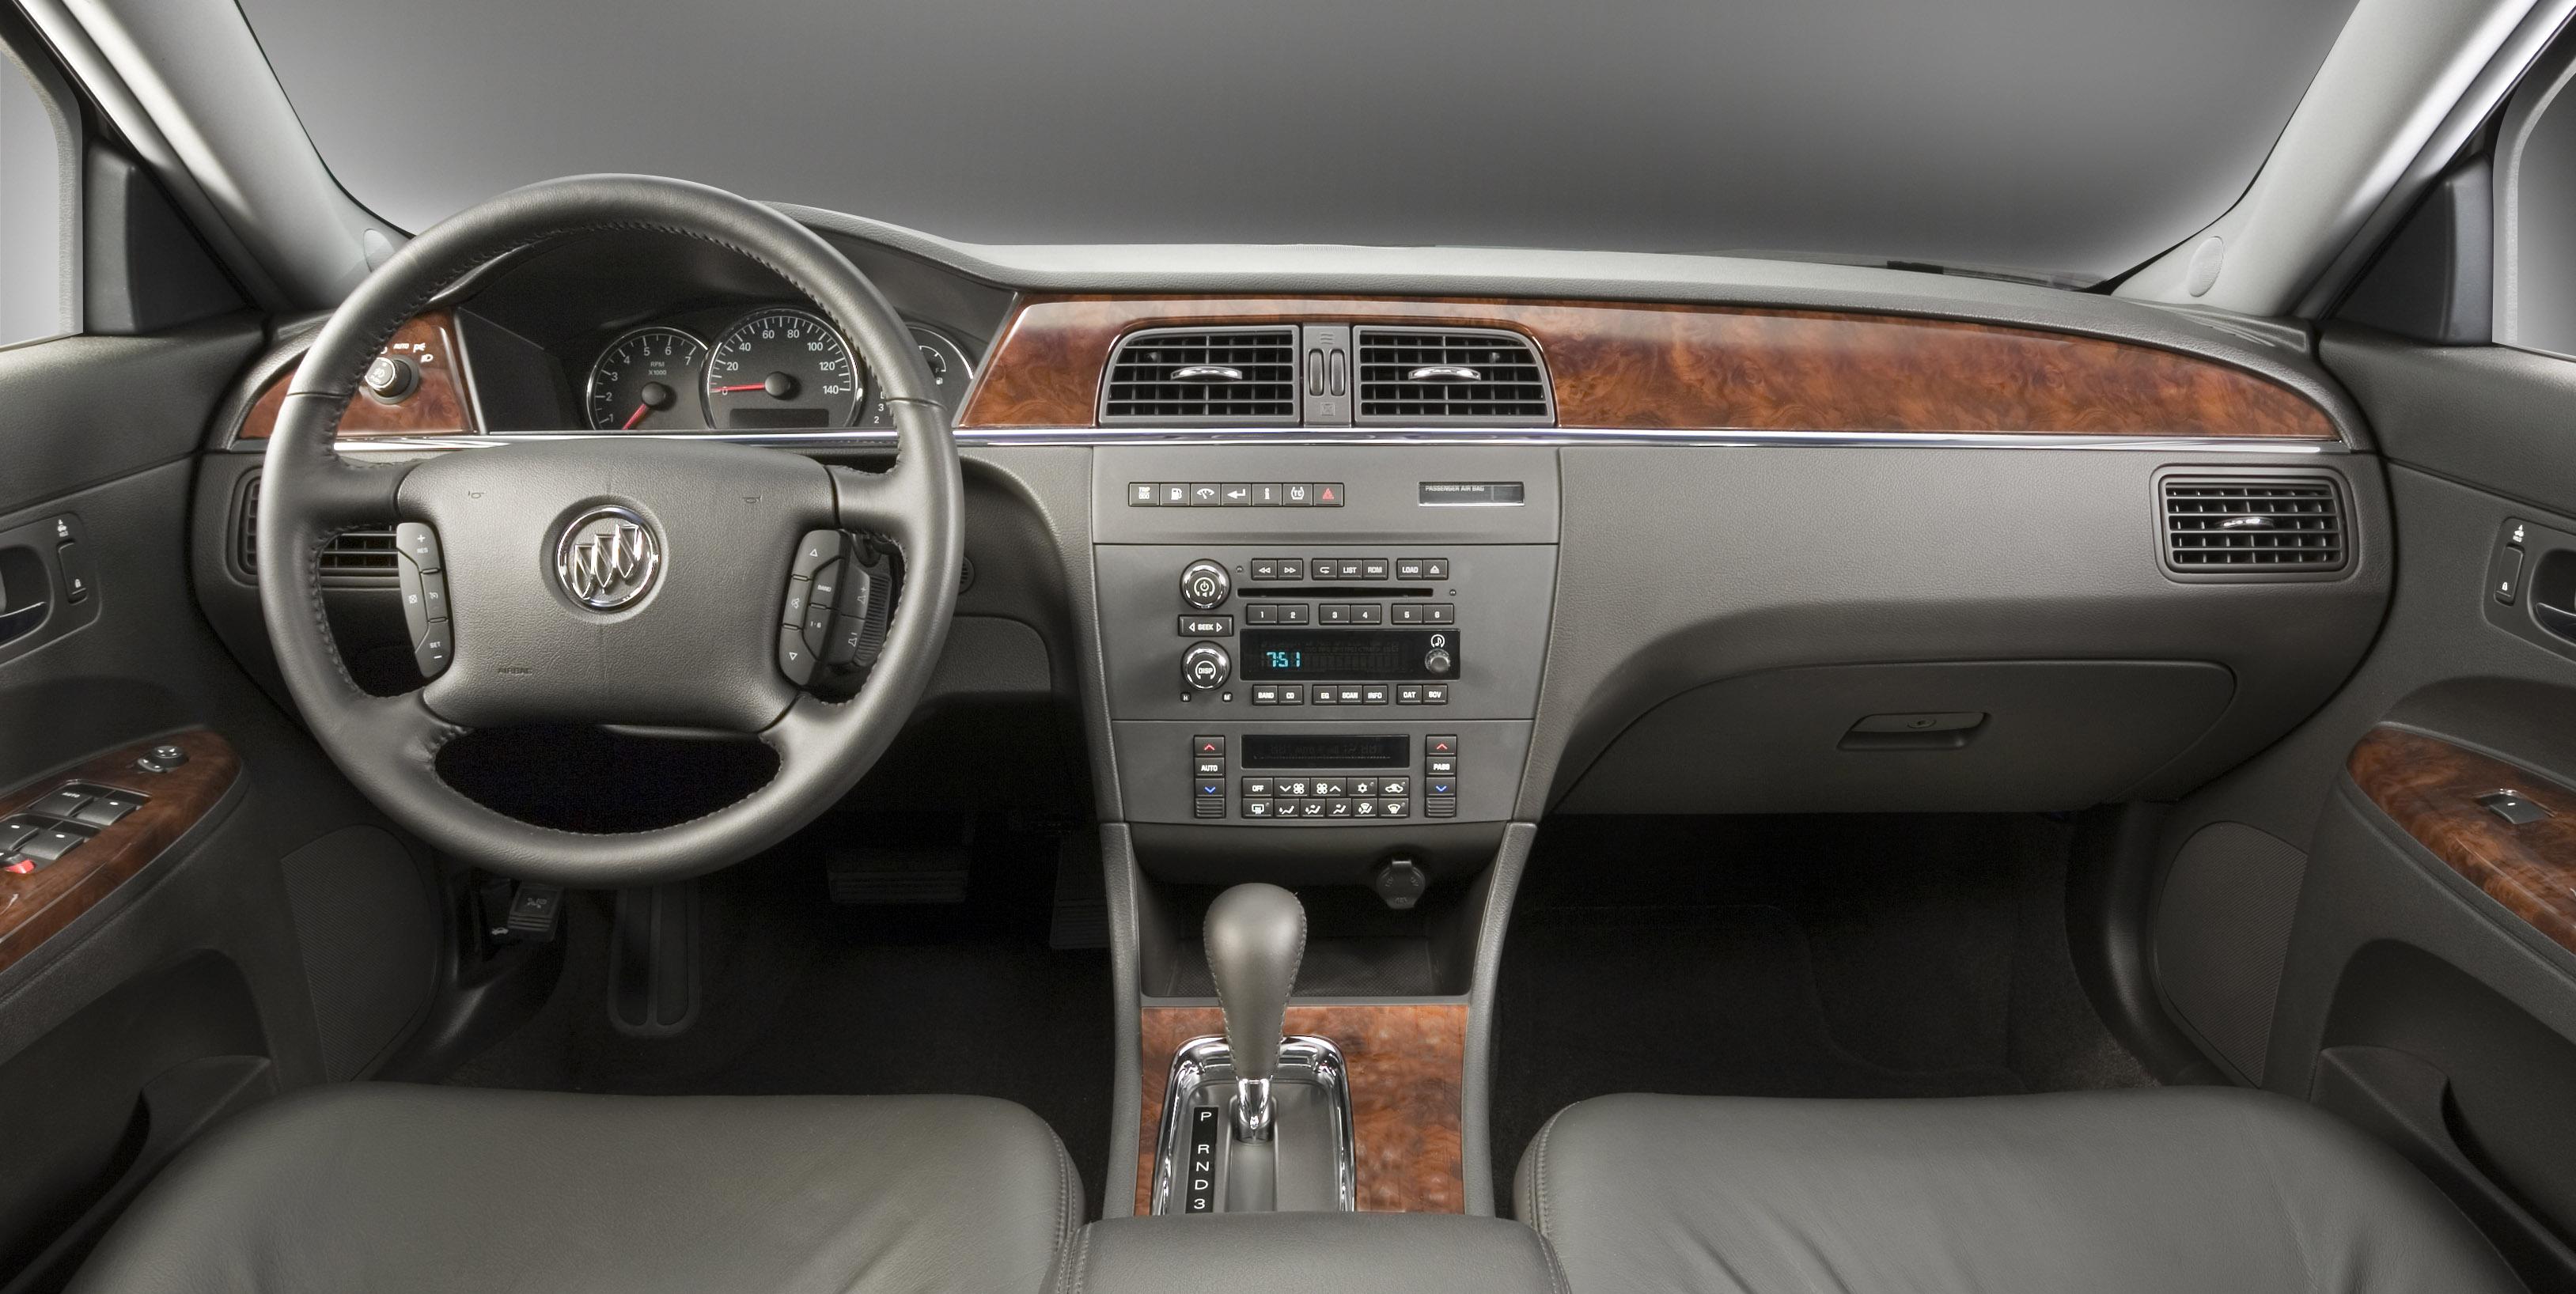 2008 Buick Lacrosse Super Exhaust images